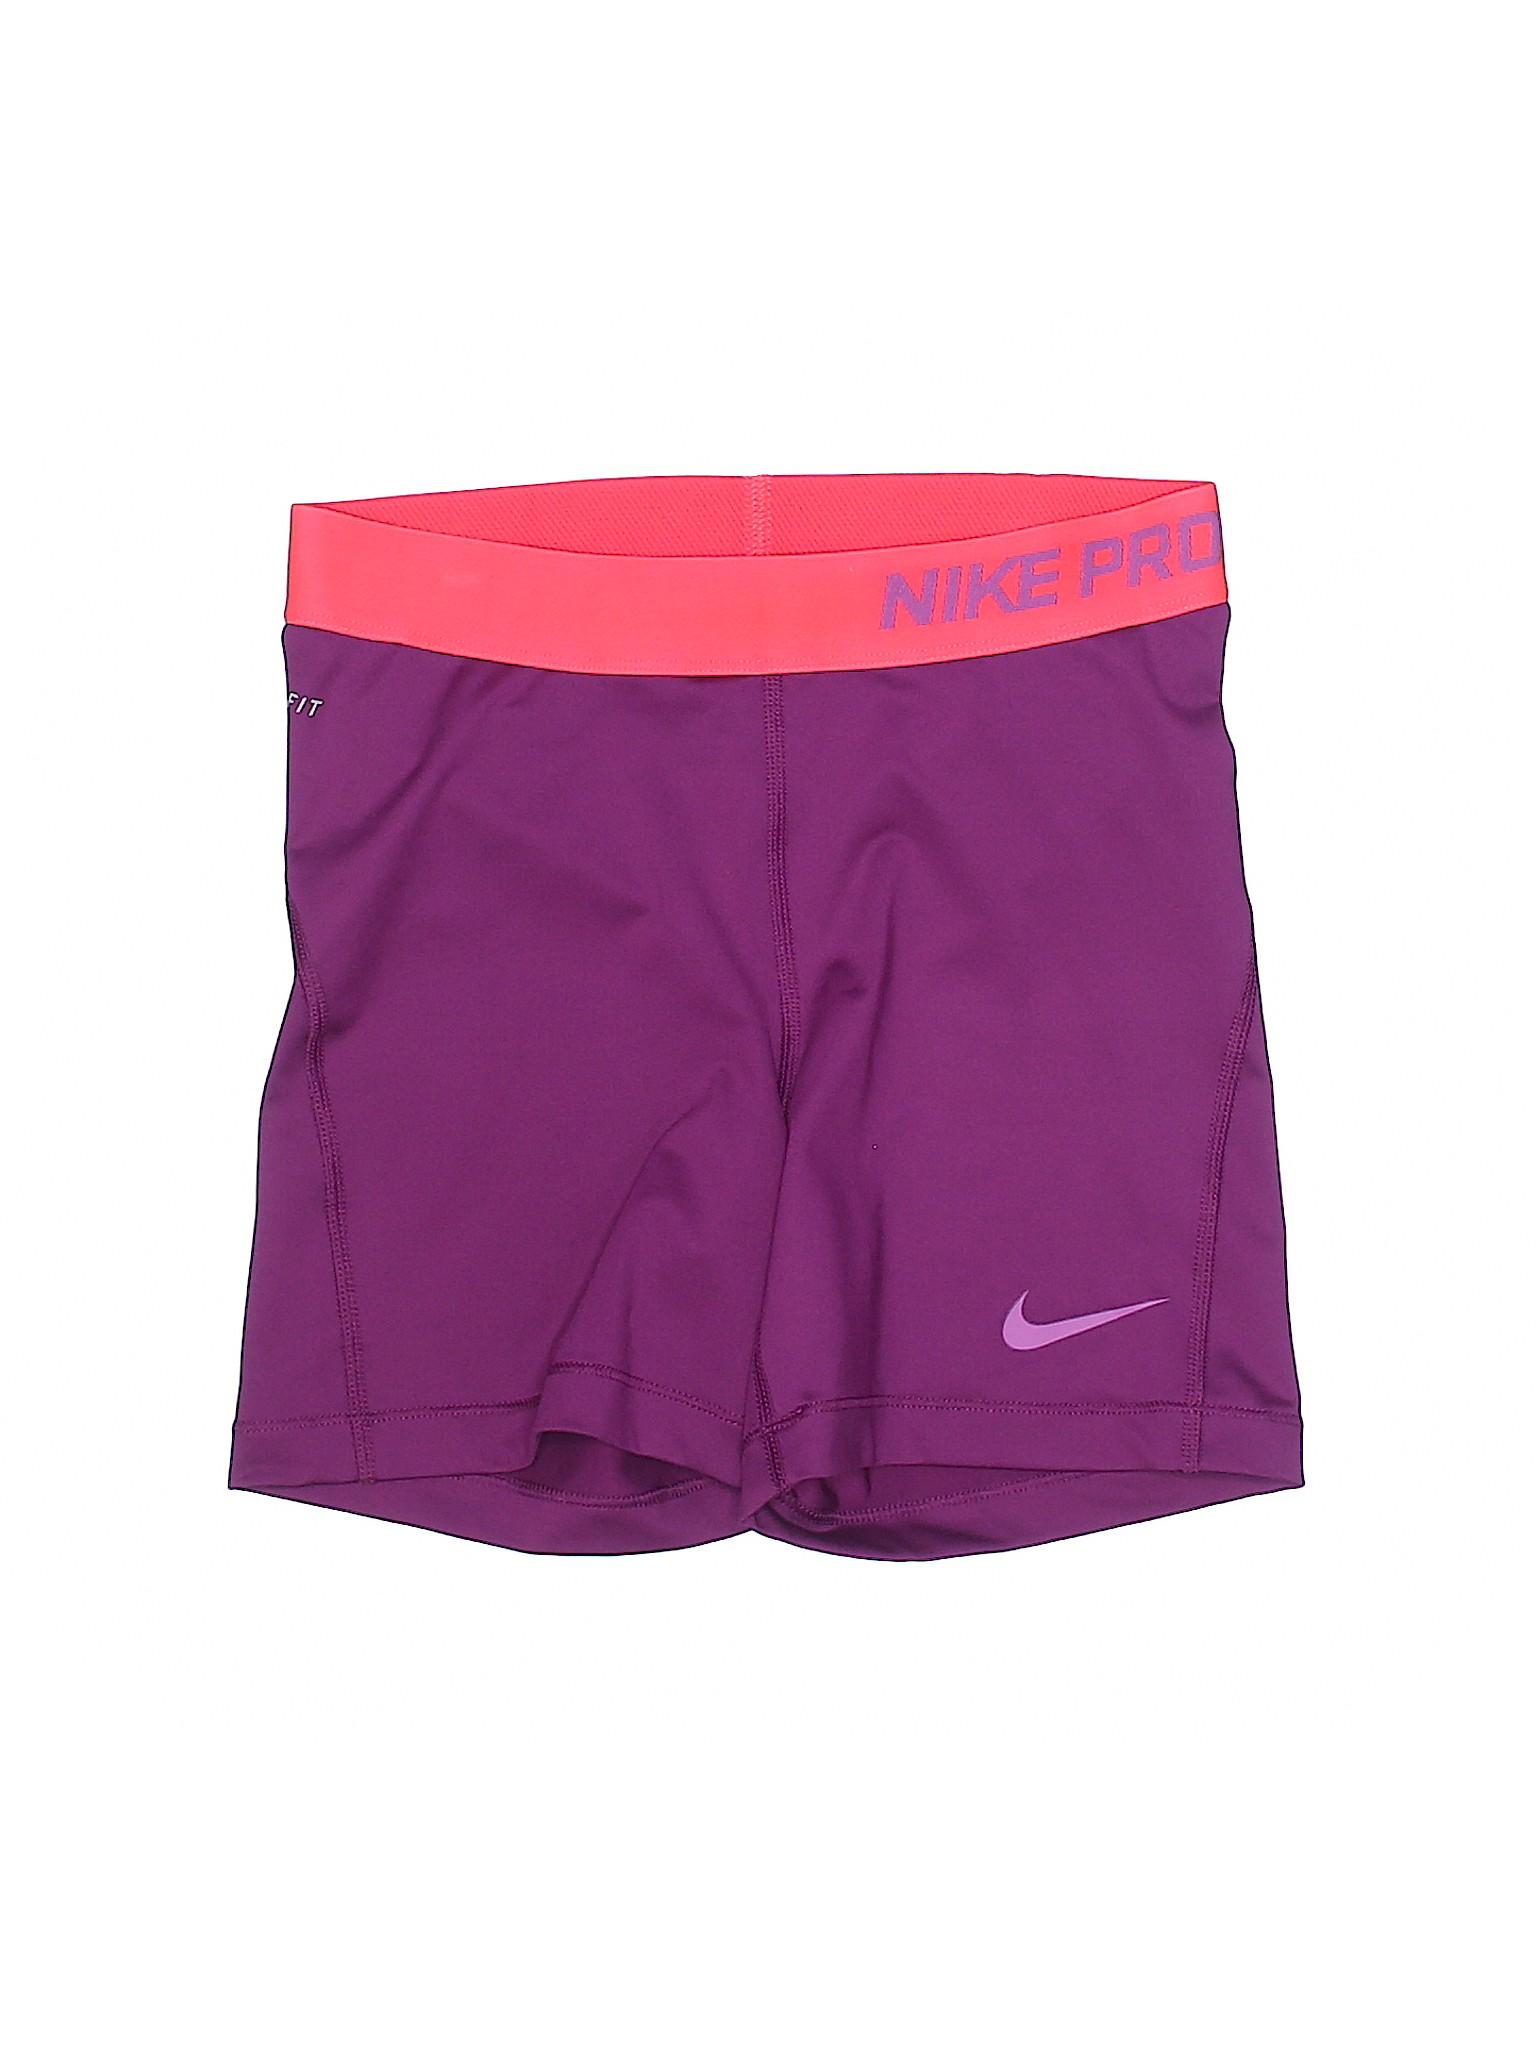 Boutique Boutique Shorts Boutique Athletic Nike Athletic Boutique Nike Athletic Athletic Shorts Nike Shorts Nike 16n1xWvOB